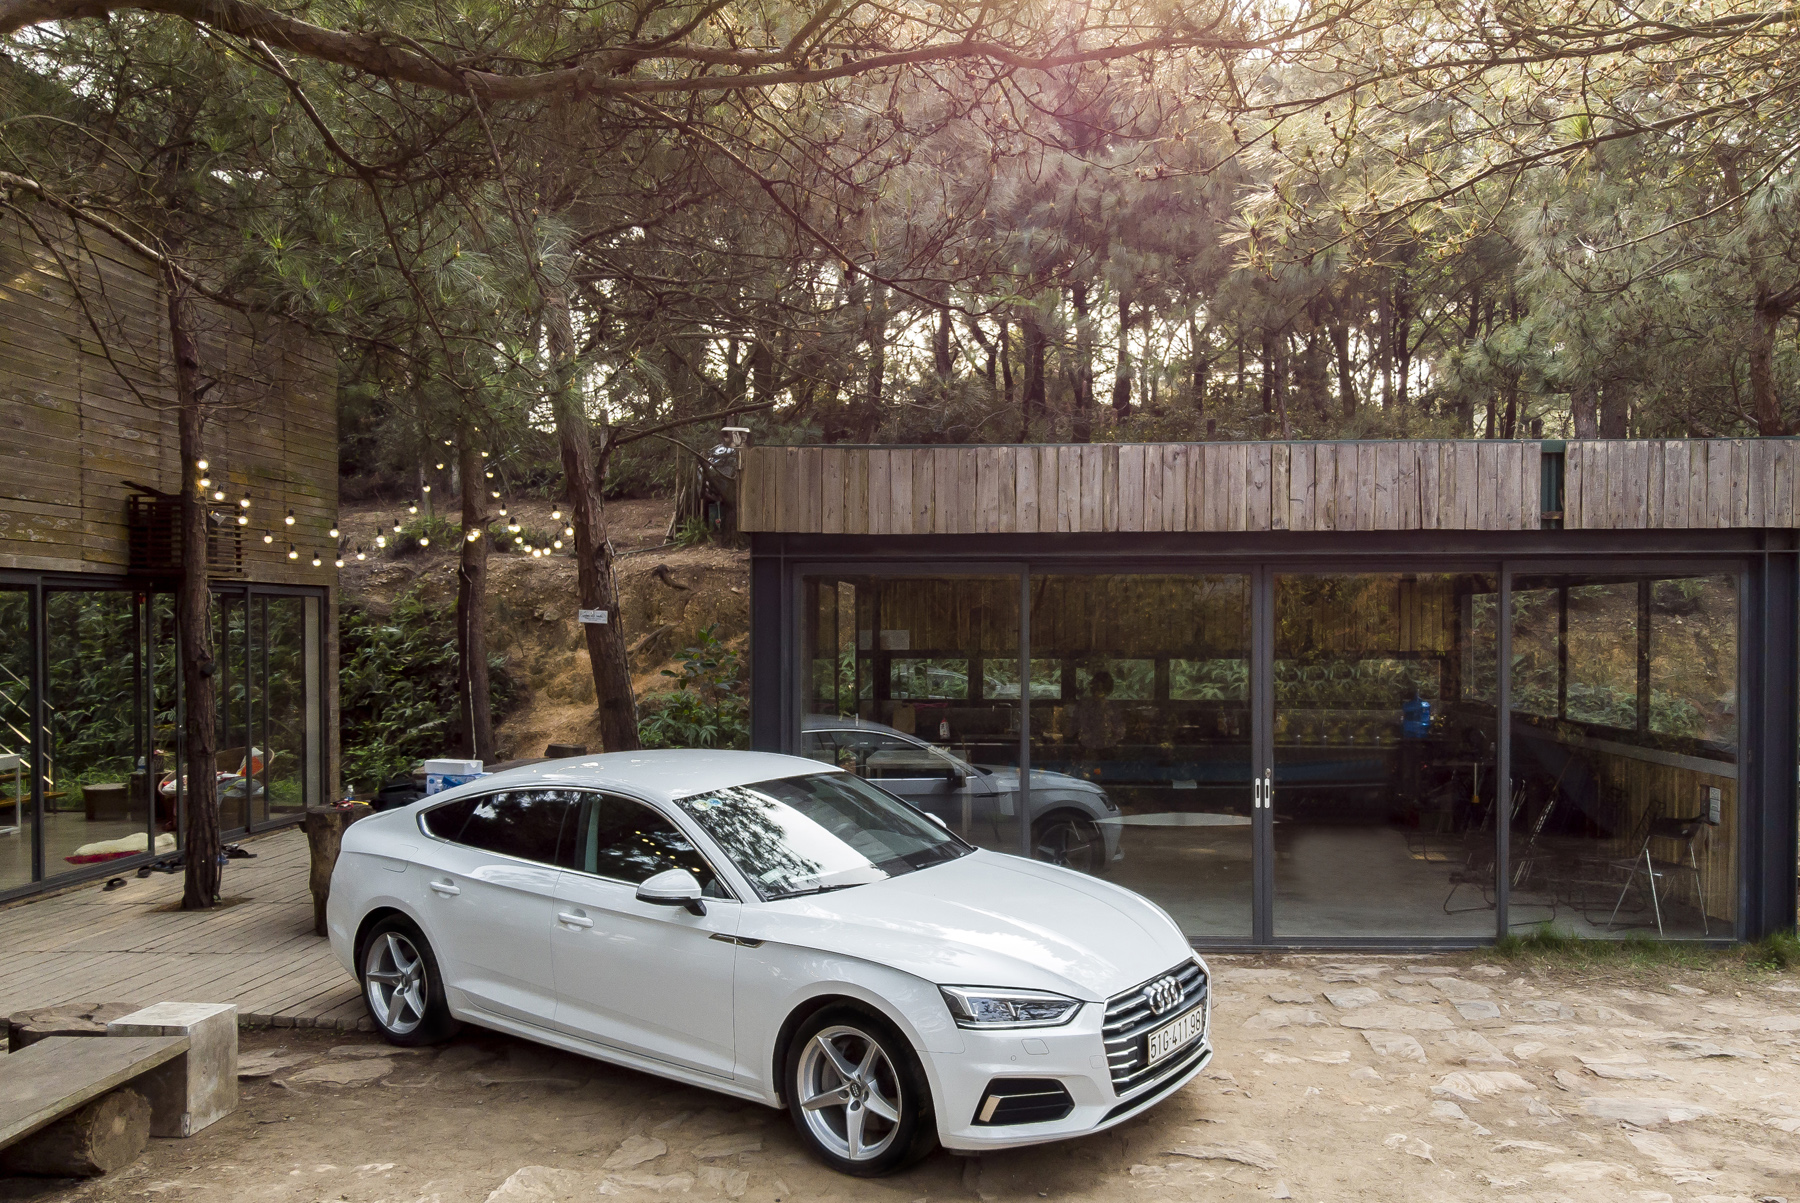 Audi-A5-Sportback-moi-tai-Viet-Nam-An-xang-it-hon-ma-manh-hon-anh-2